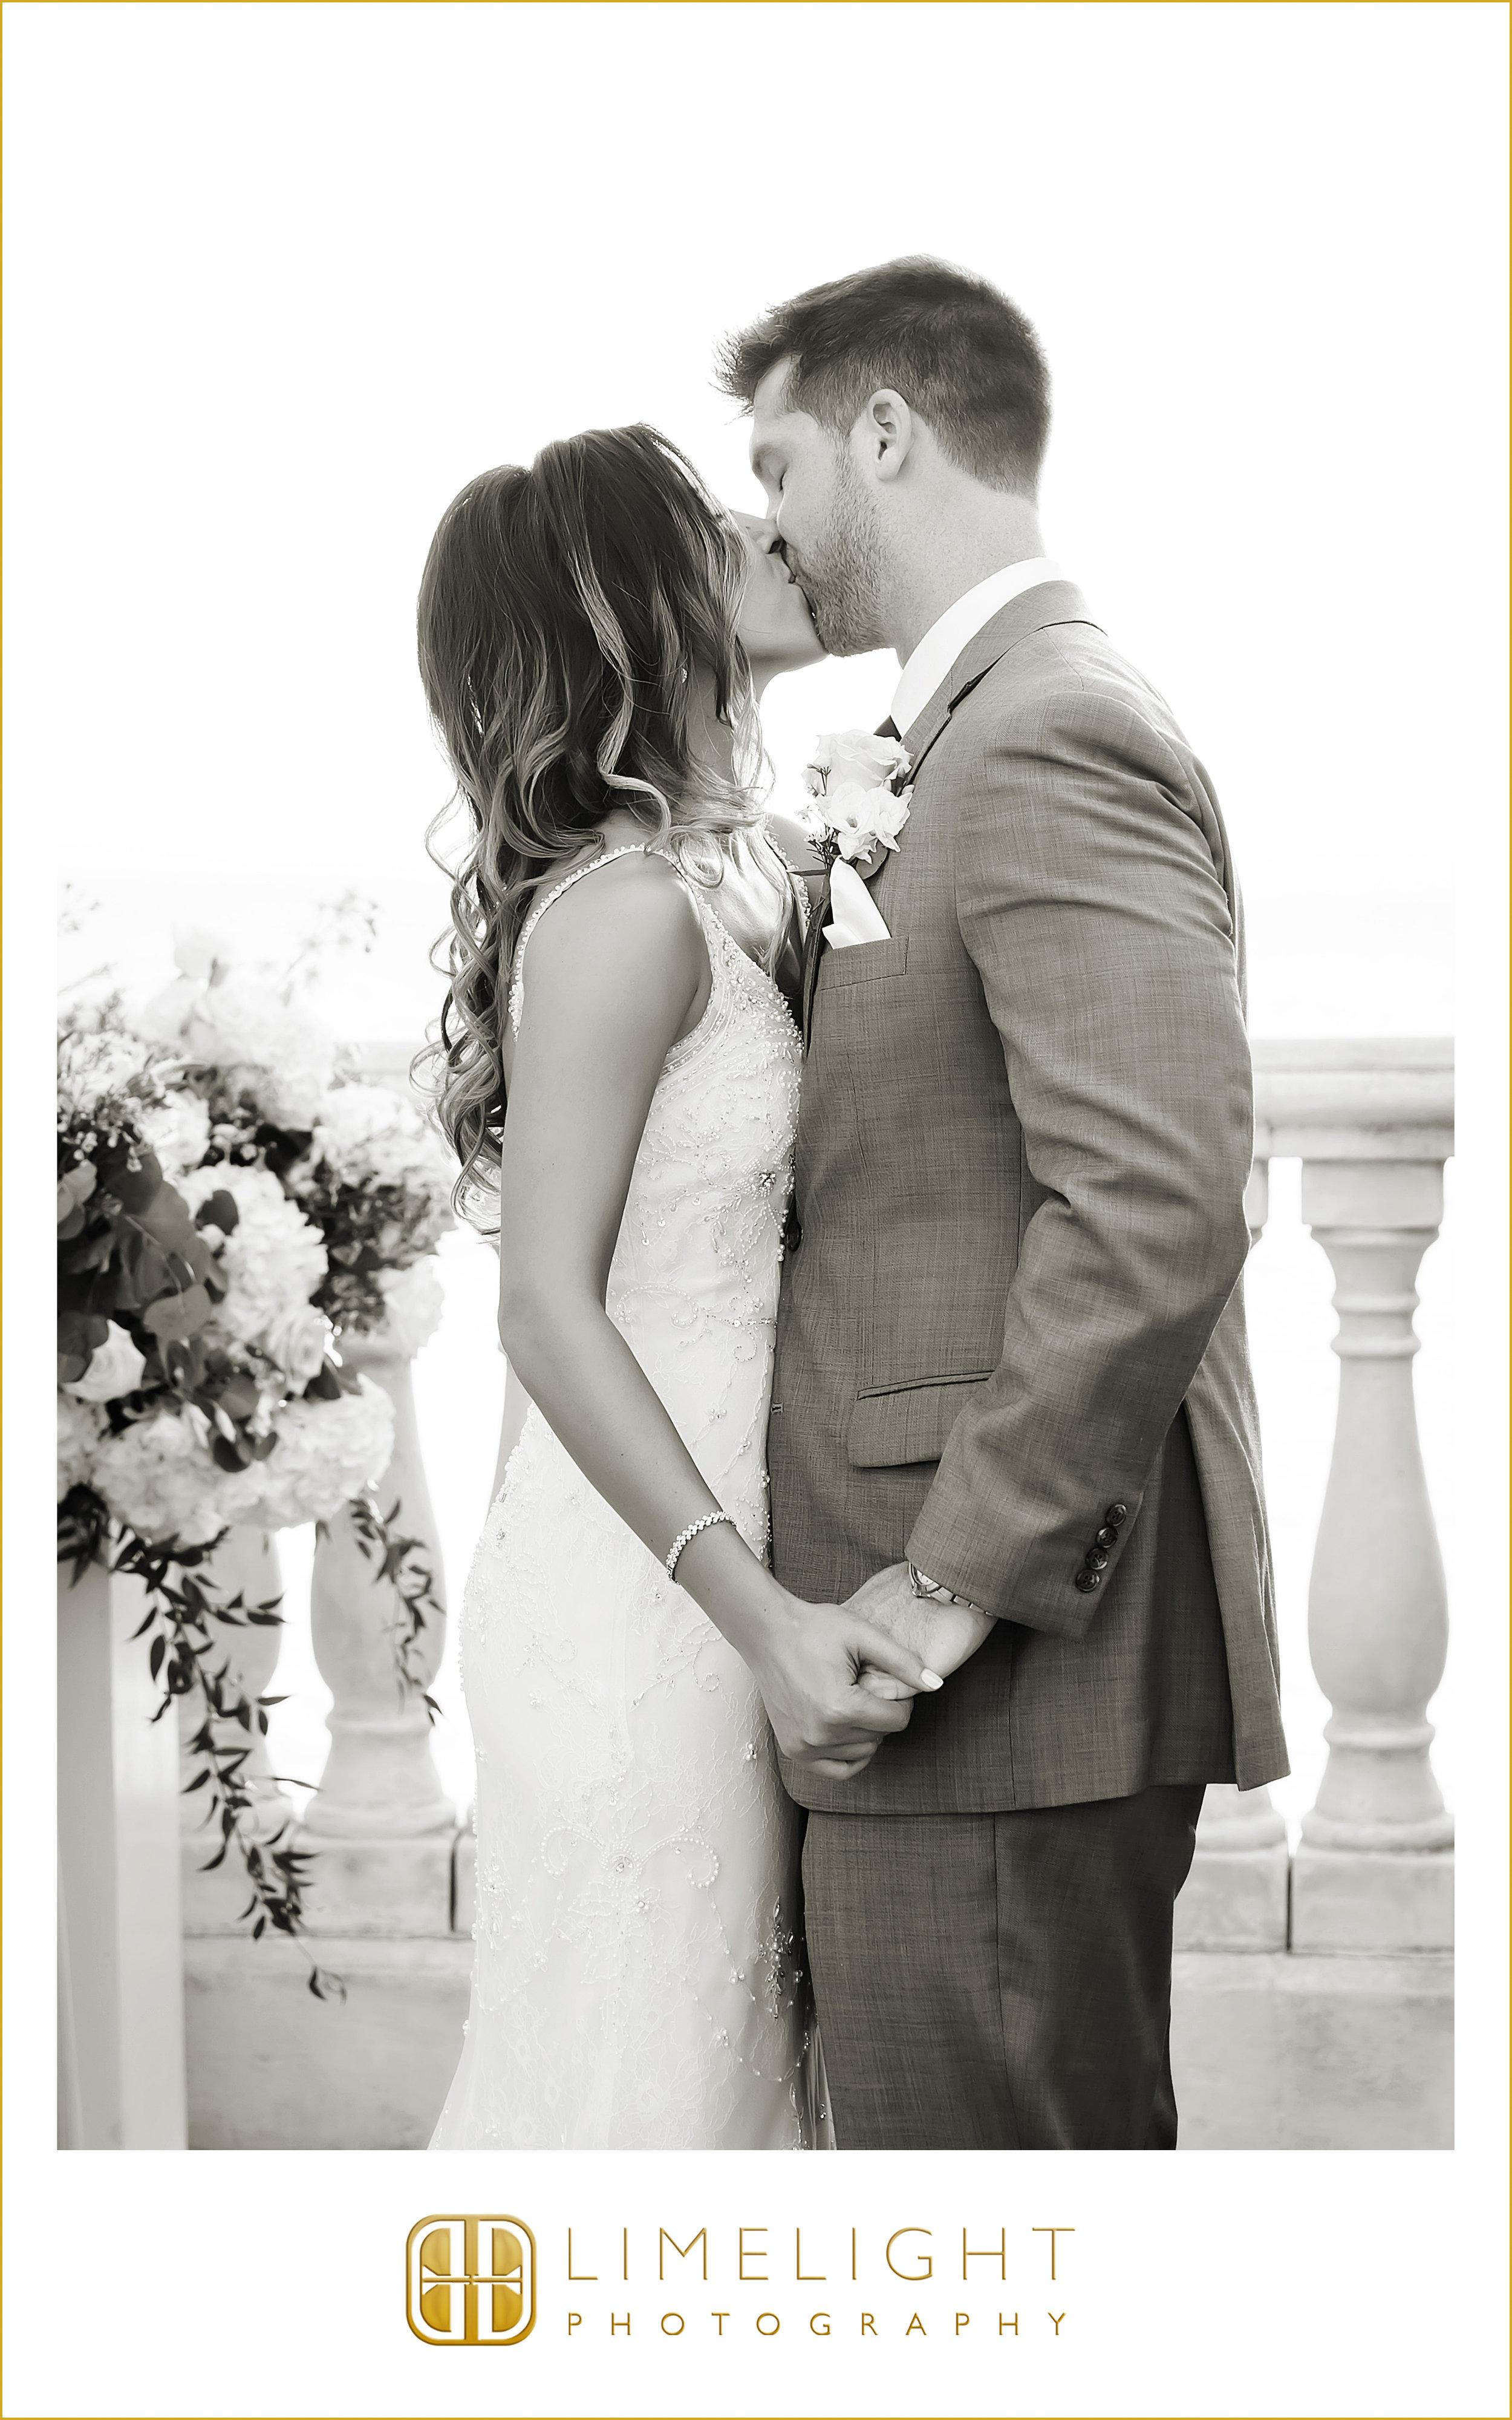 Mr. & Mrs. | Ceremony | Wedding